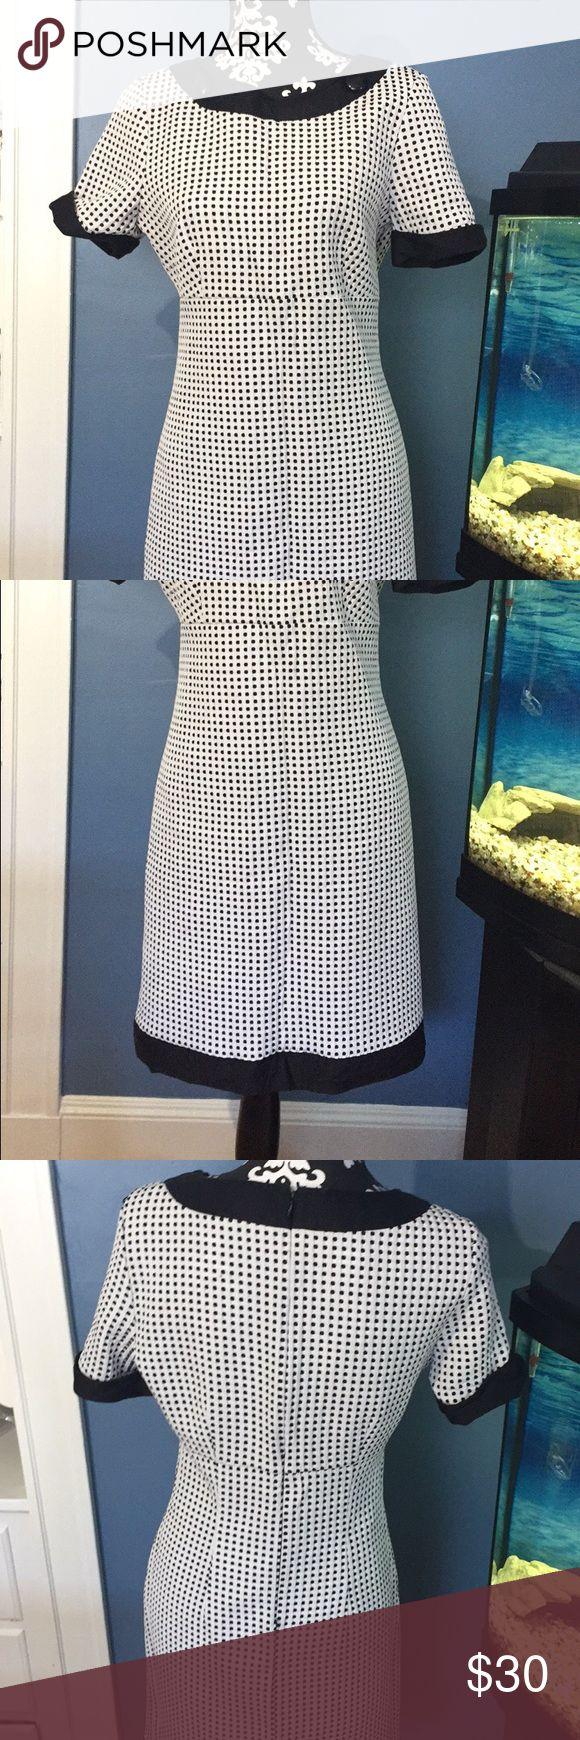 Donna Morgan Small Polka Dot Dress Donna Morgan Polka Dot Dress. Worn twice. In great condition! Size 10. Donna Morgan Dresses Midi